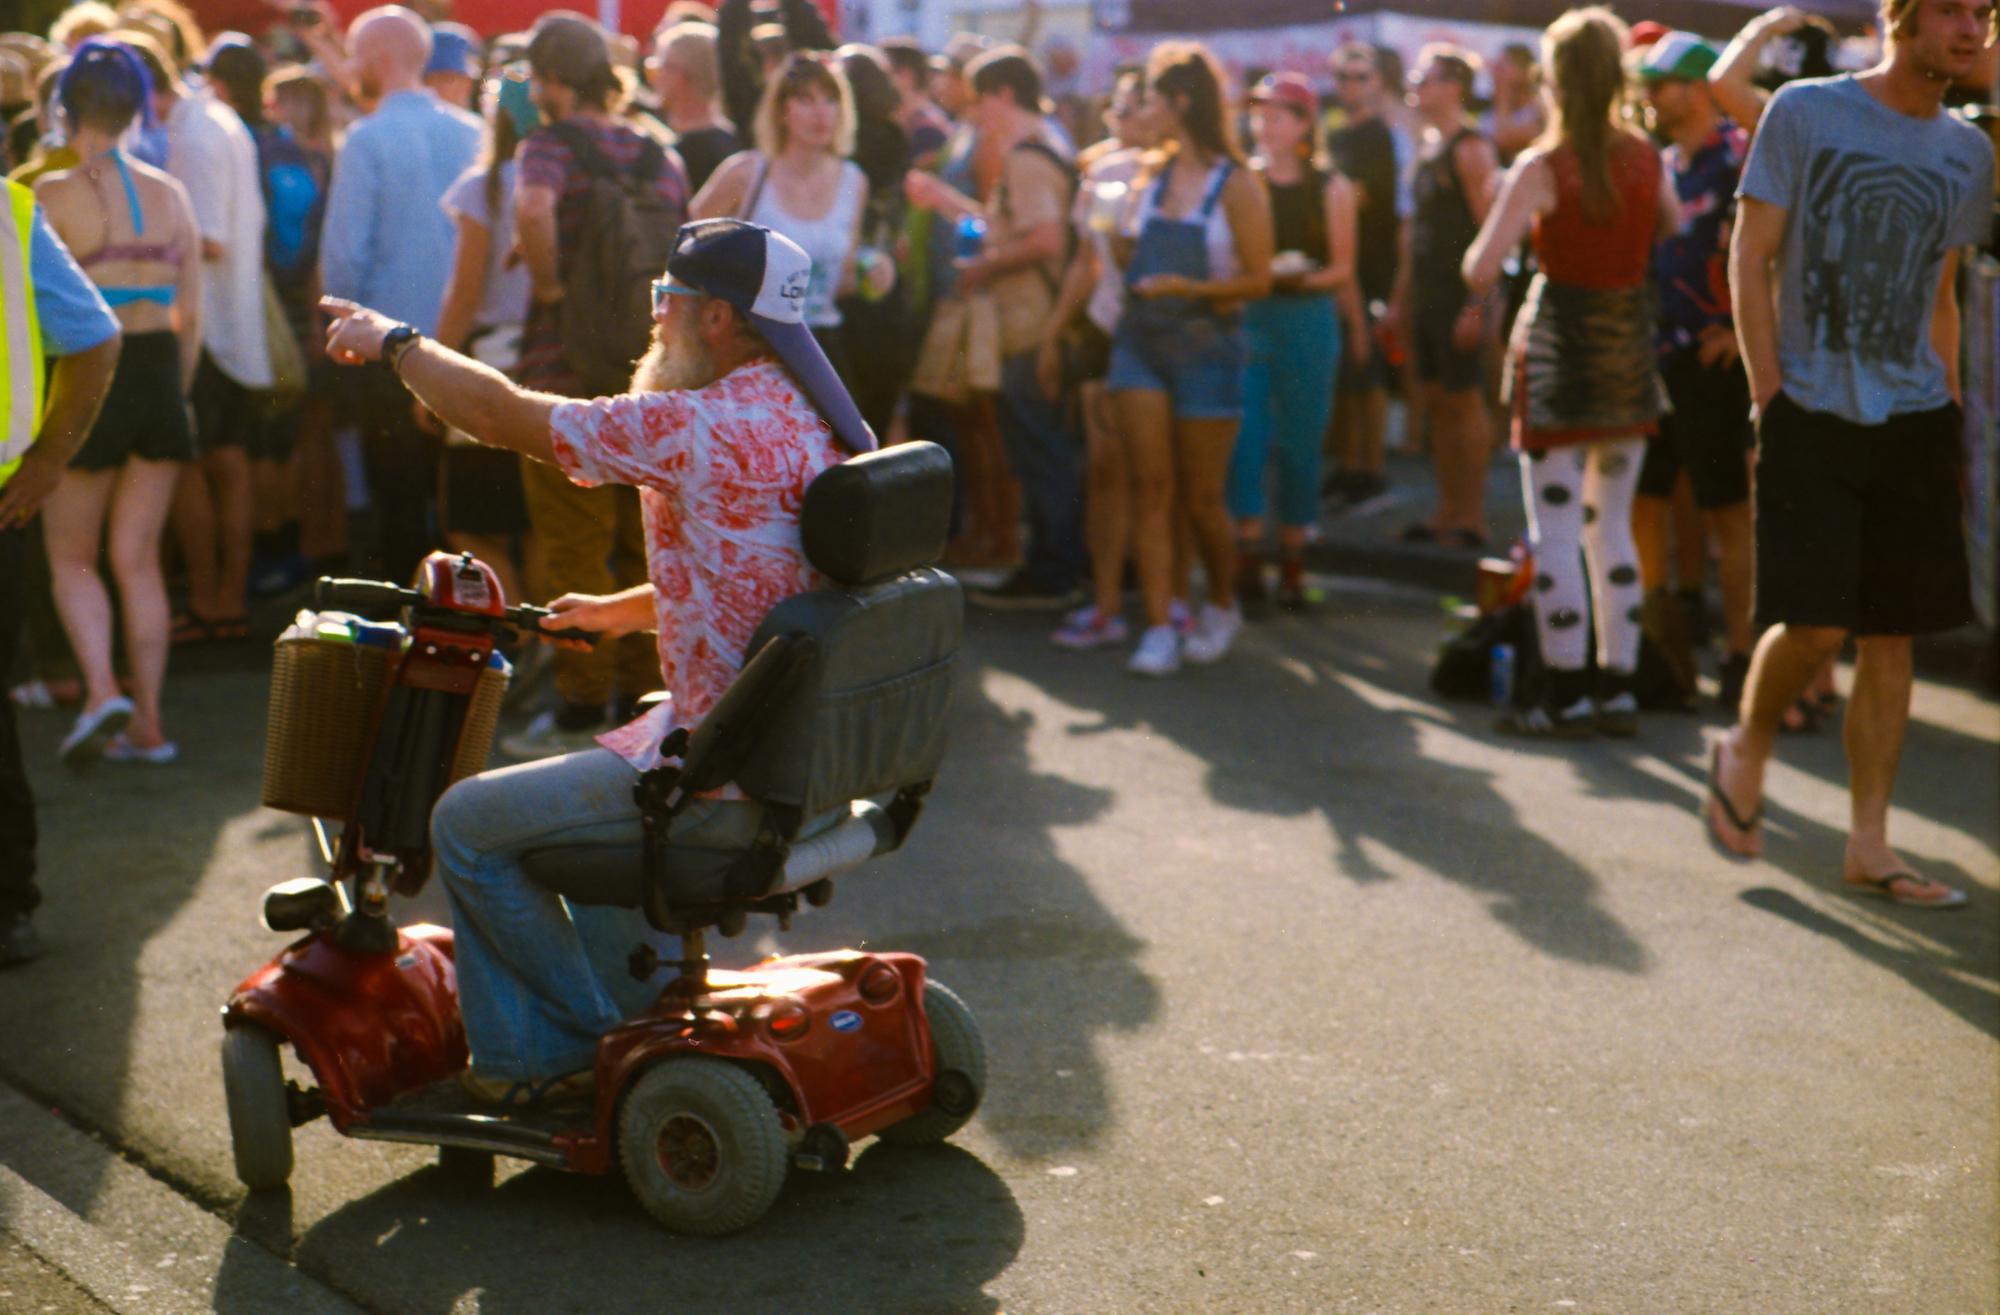 Newtown Festival, Nikon FE2, Nikkor 20mm f3.5, Ektar 100 35mm film